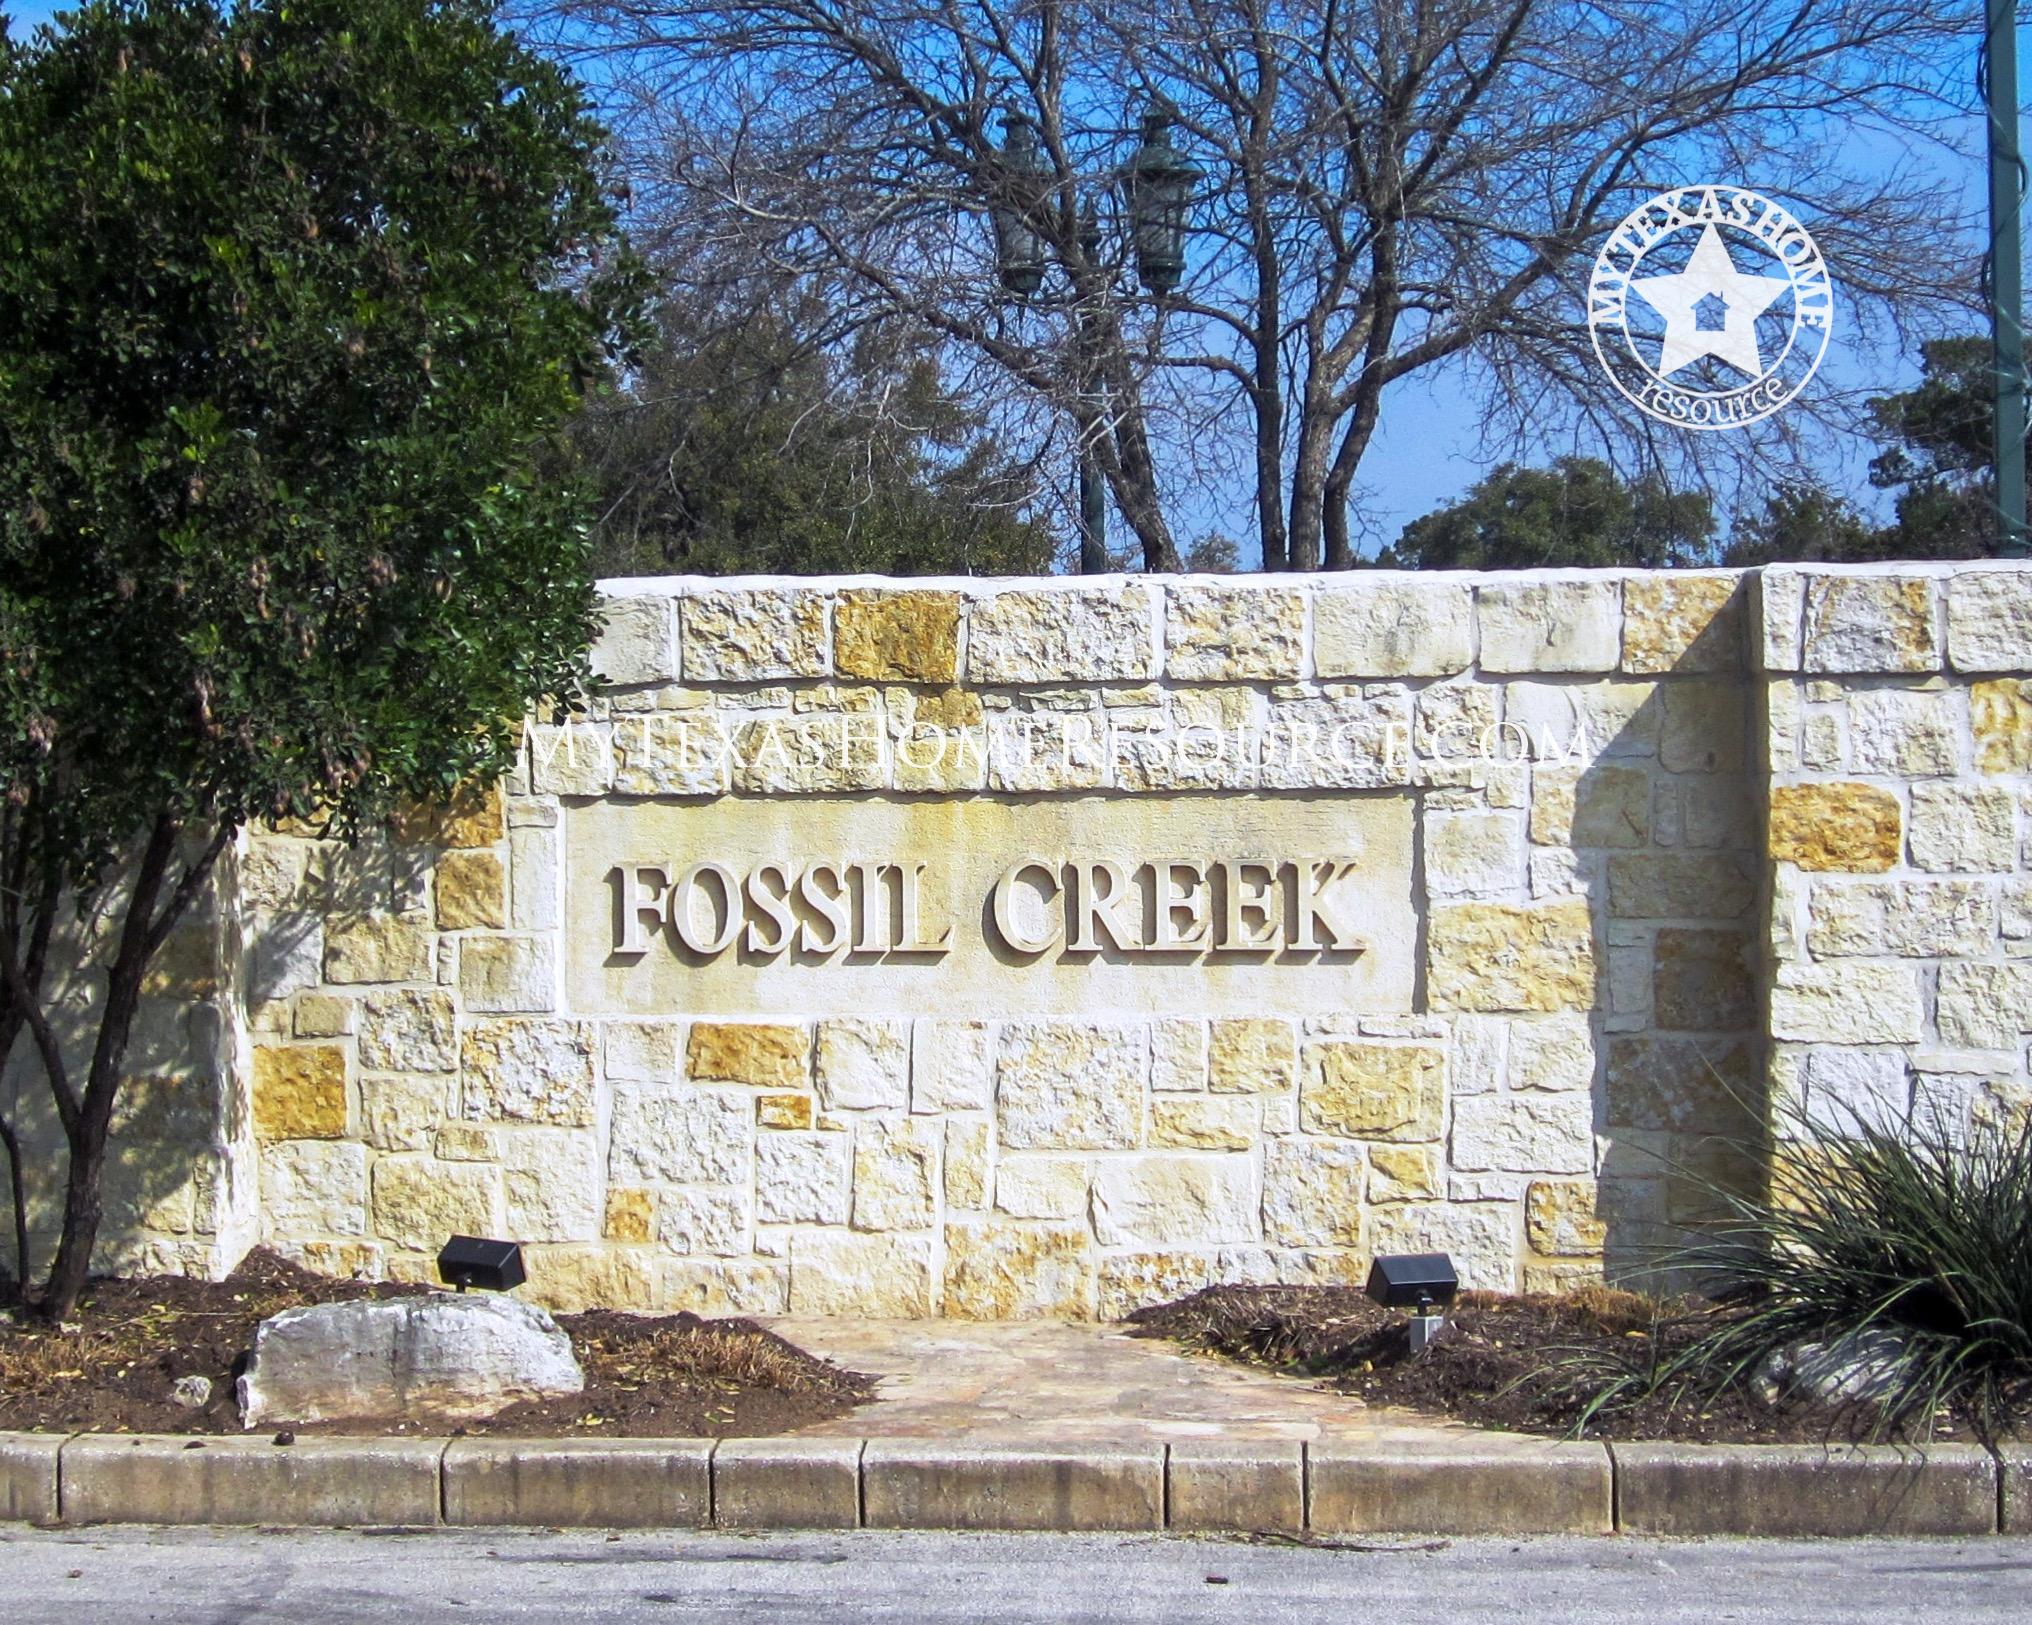 Fossil Creek Community San Antonio, TX